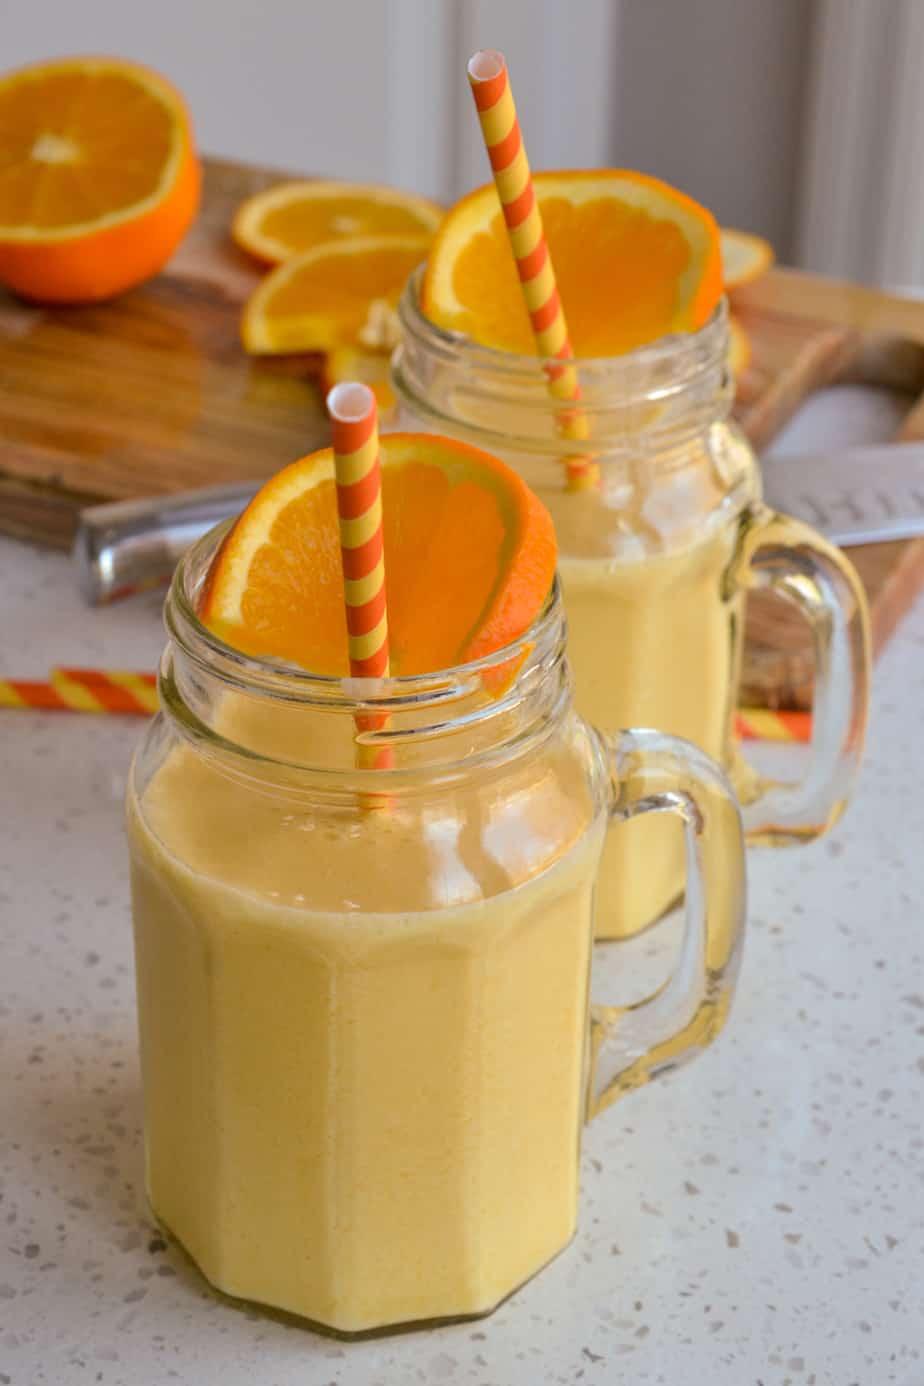 Mugs full of creamy frozen orange julius.